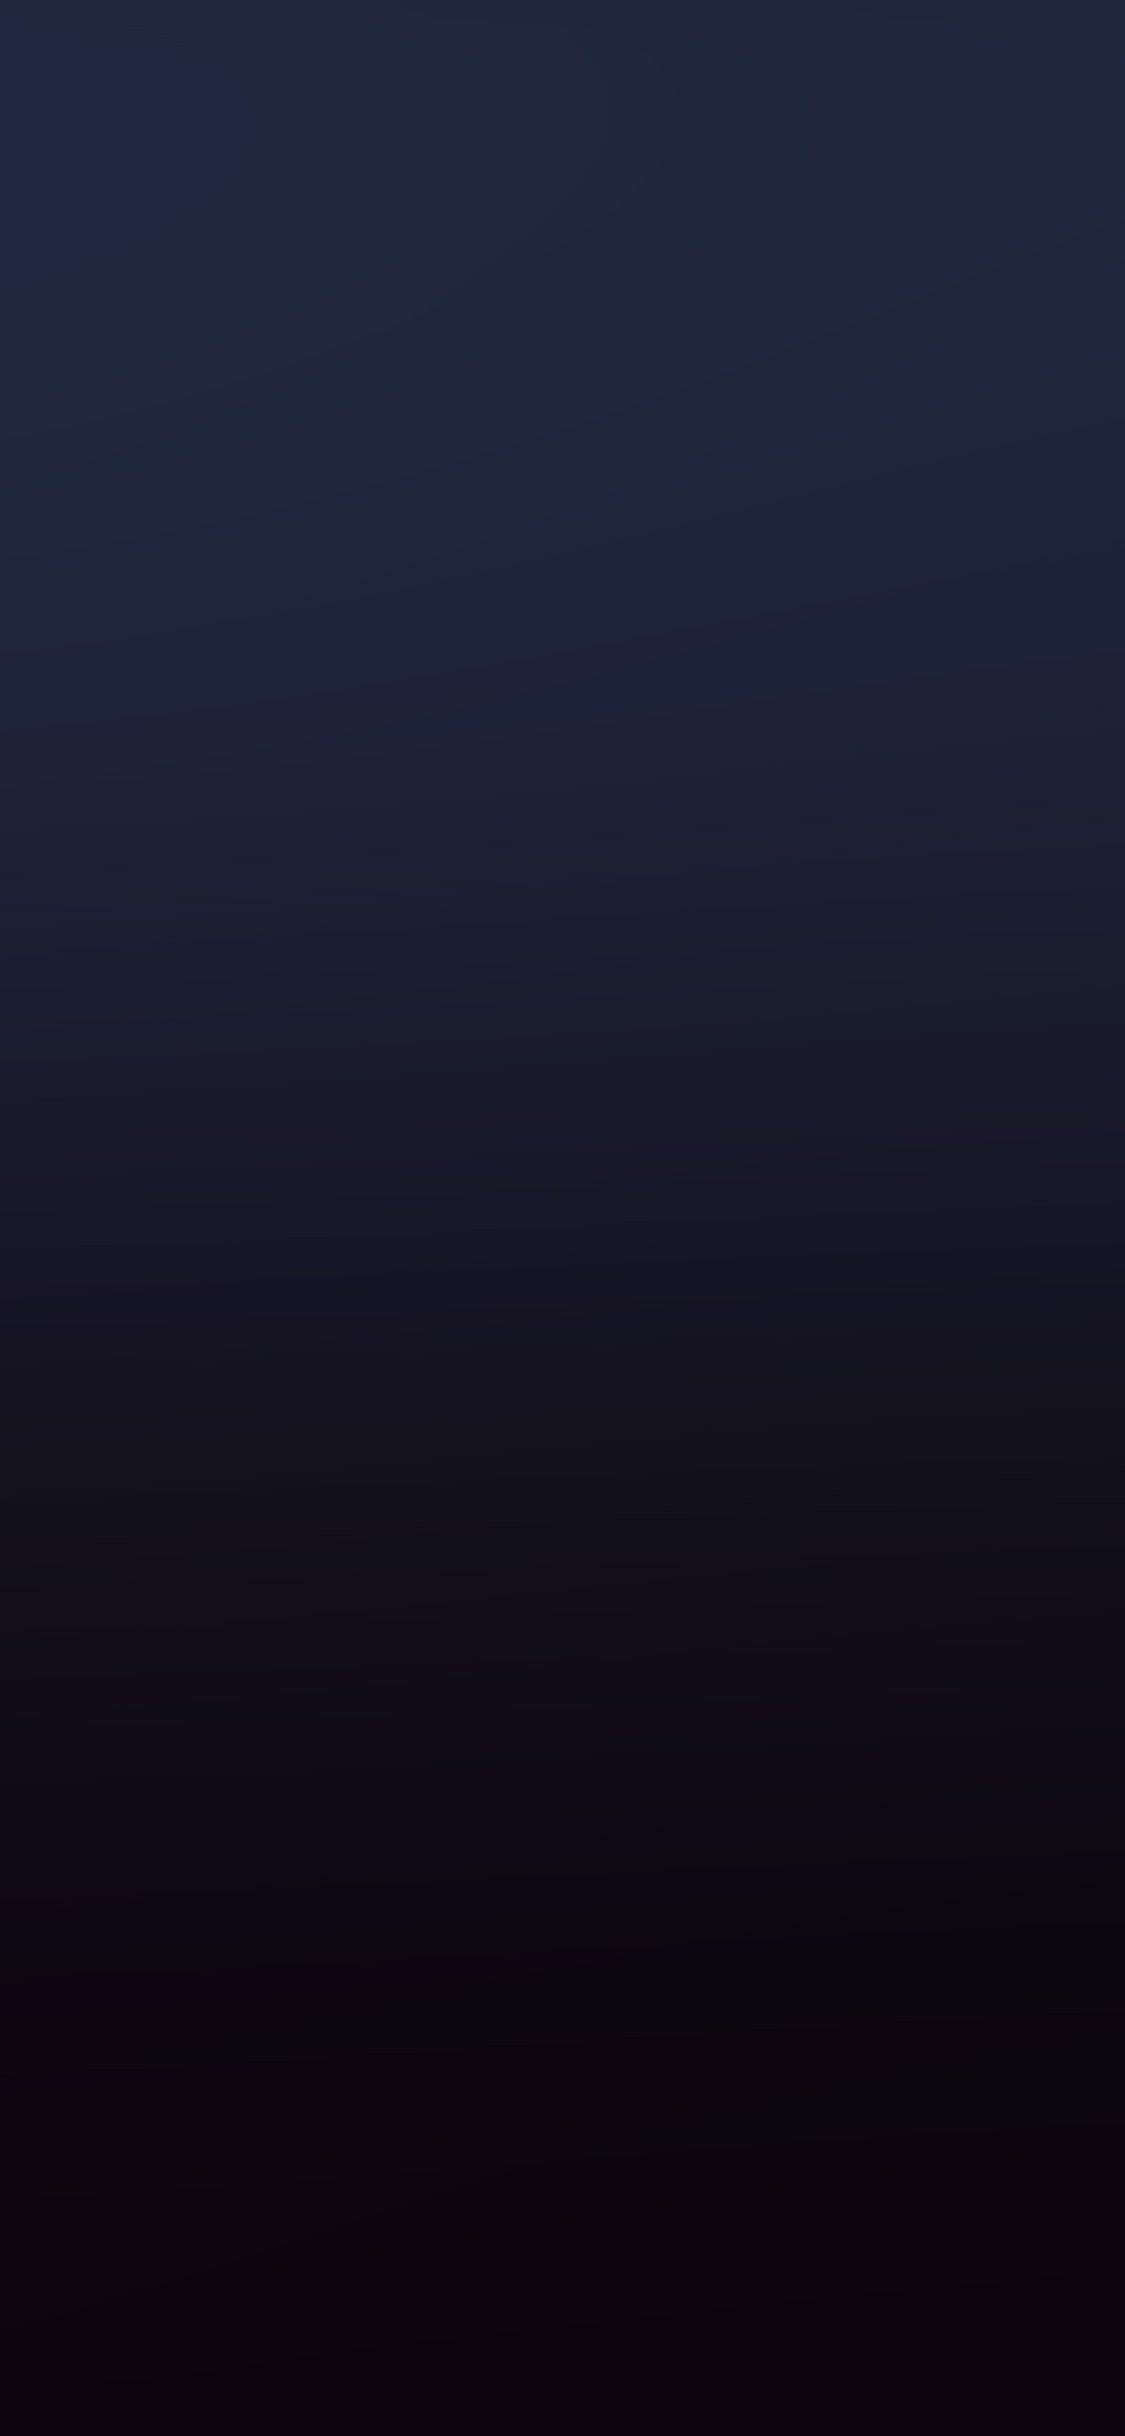 S9 Black Wallpaper Galaxy Colour Abstract Digital